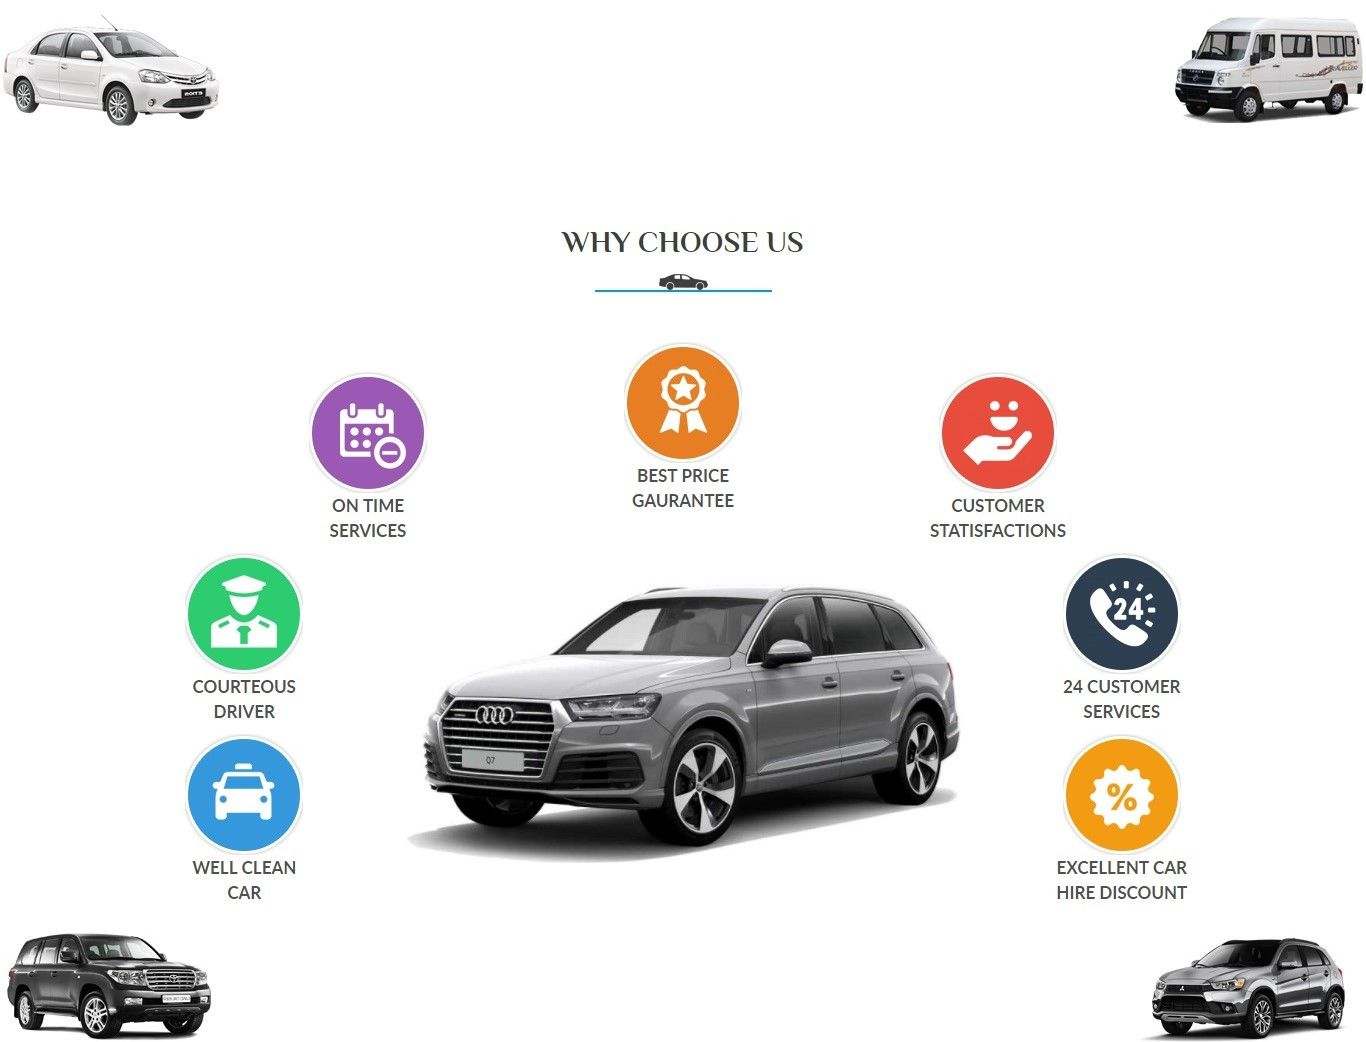 Local Car Rental >> Jcr Cab And Car Rental Rajasthan Is The Best Car Rental Company